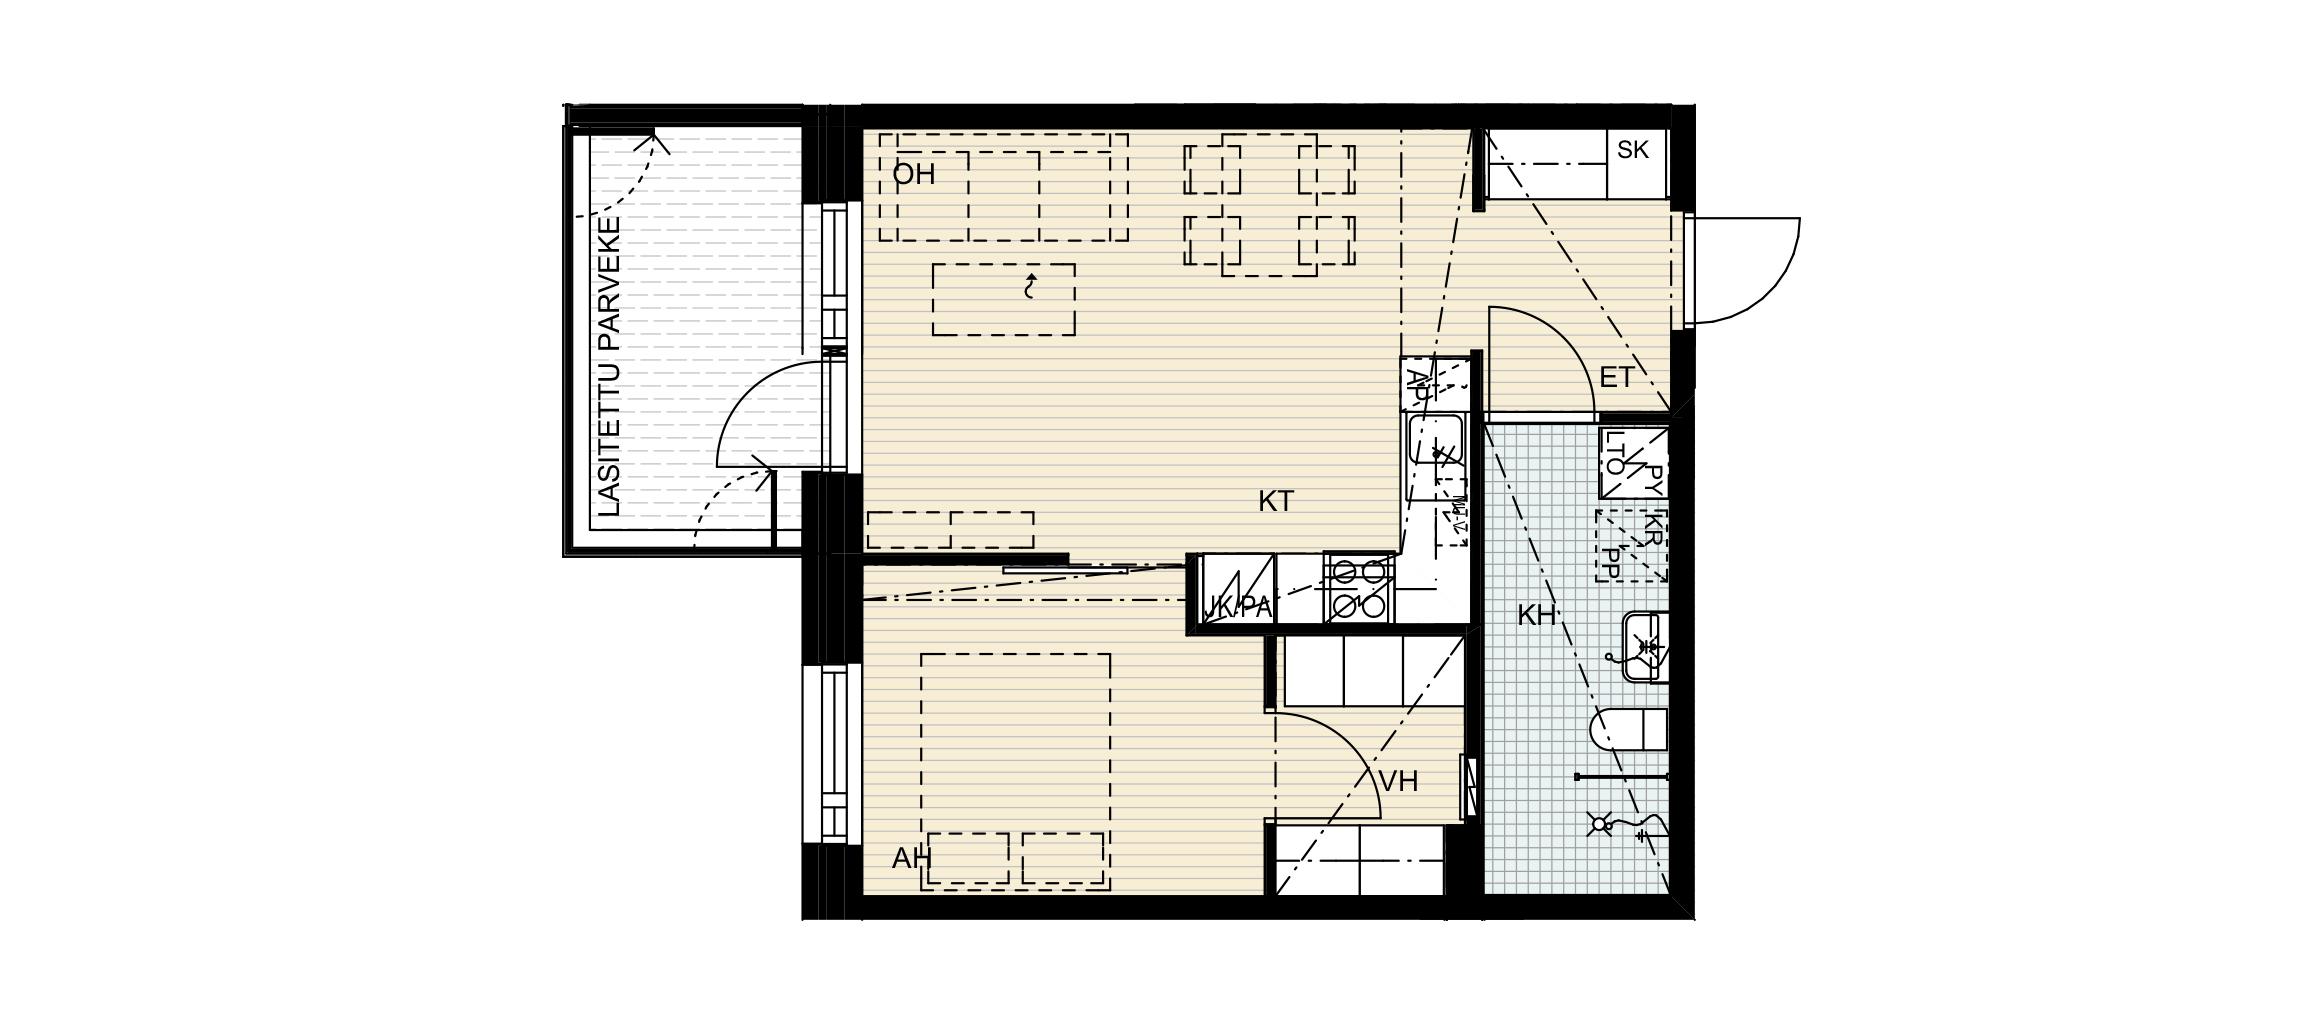 Nuttukuja 6, 2h + kt, 44 m2